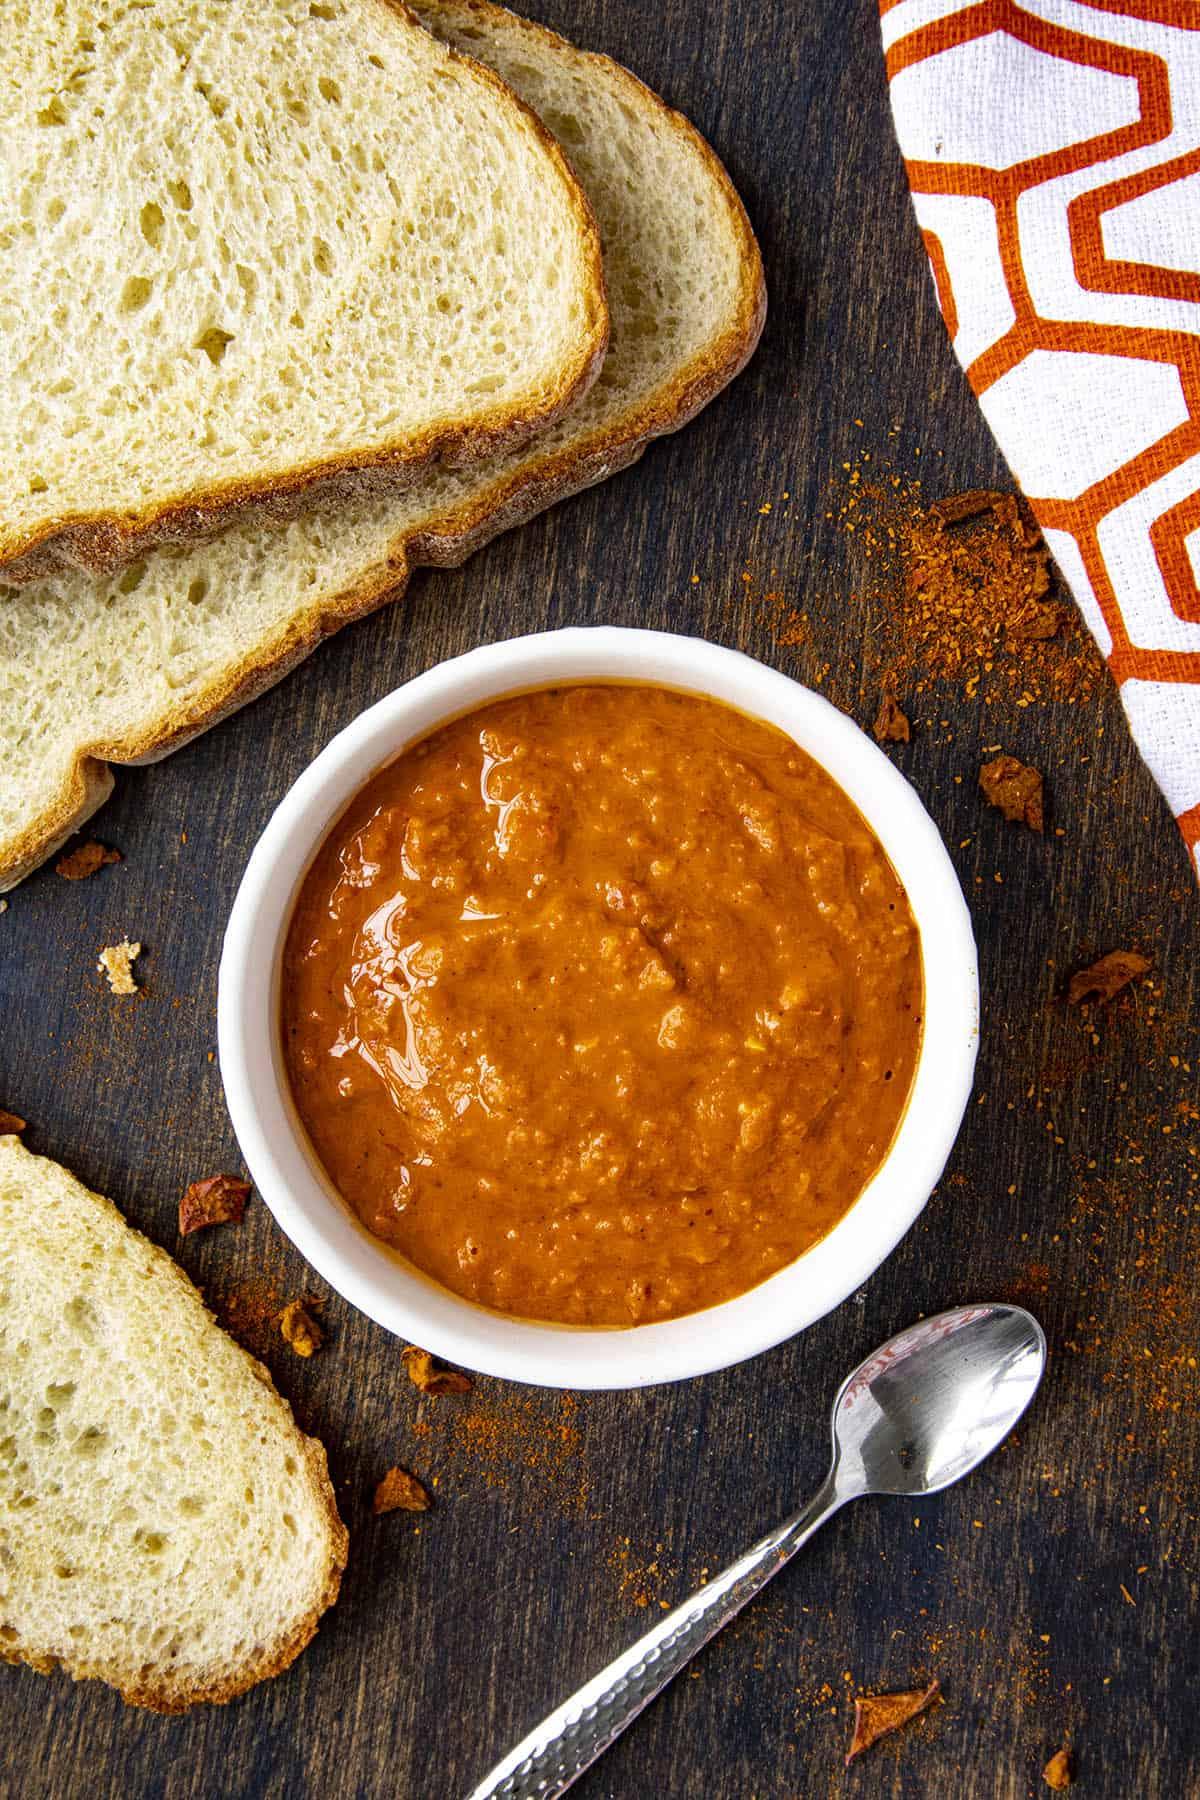 Mojo Picon sauce in a bowl, ready to enjoy